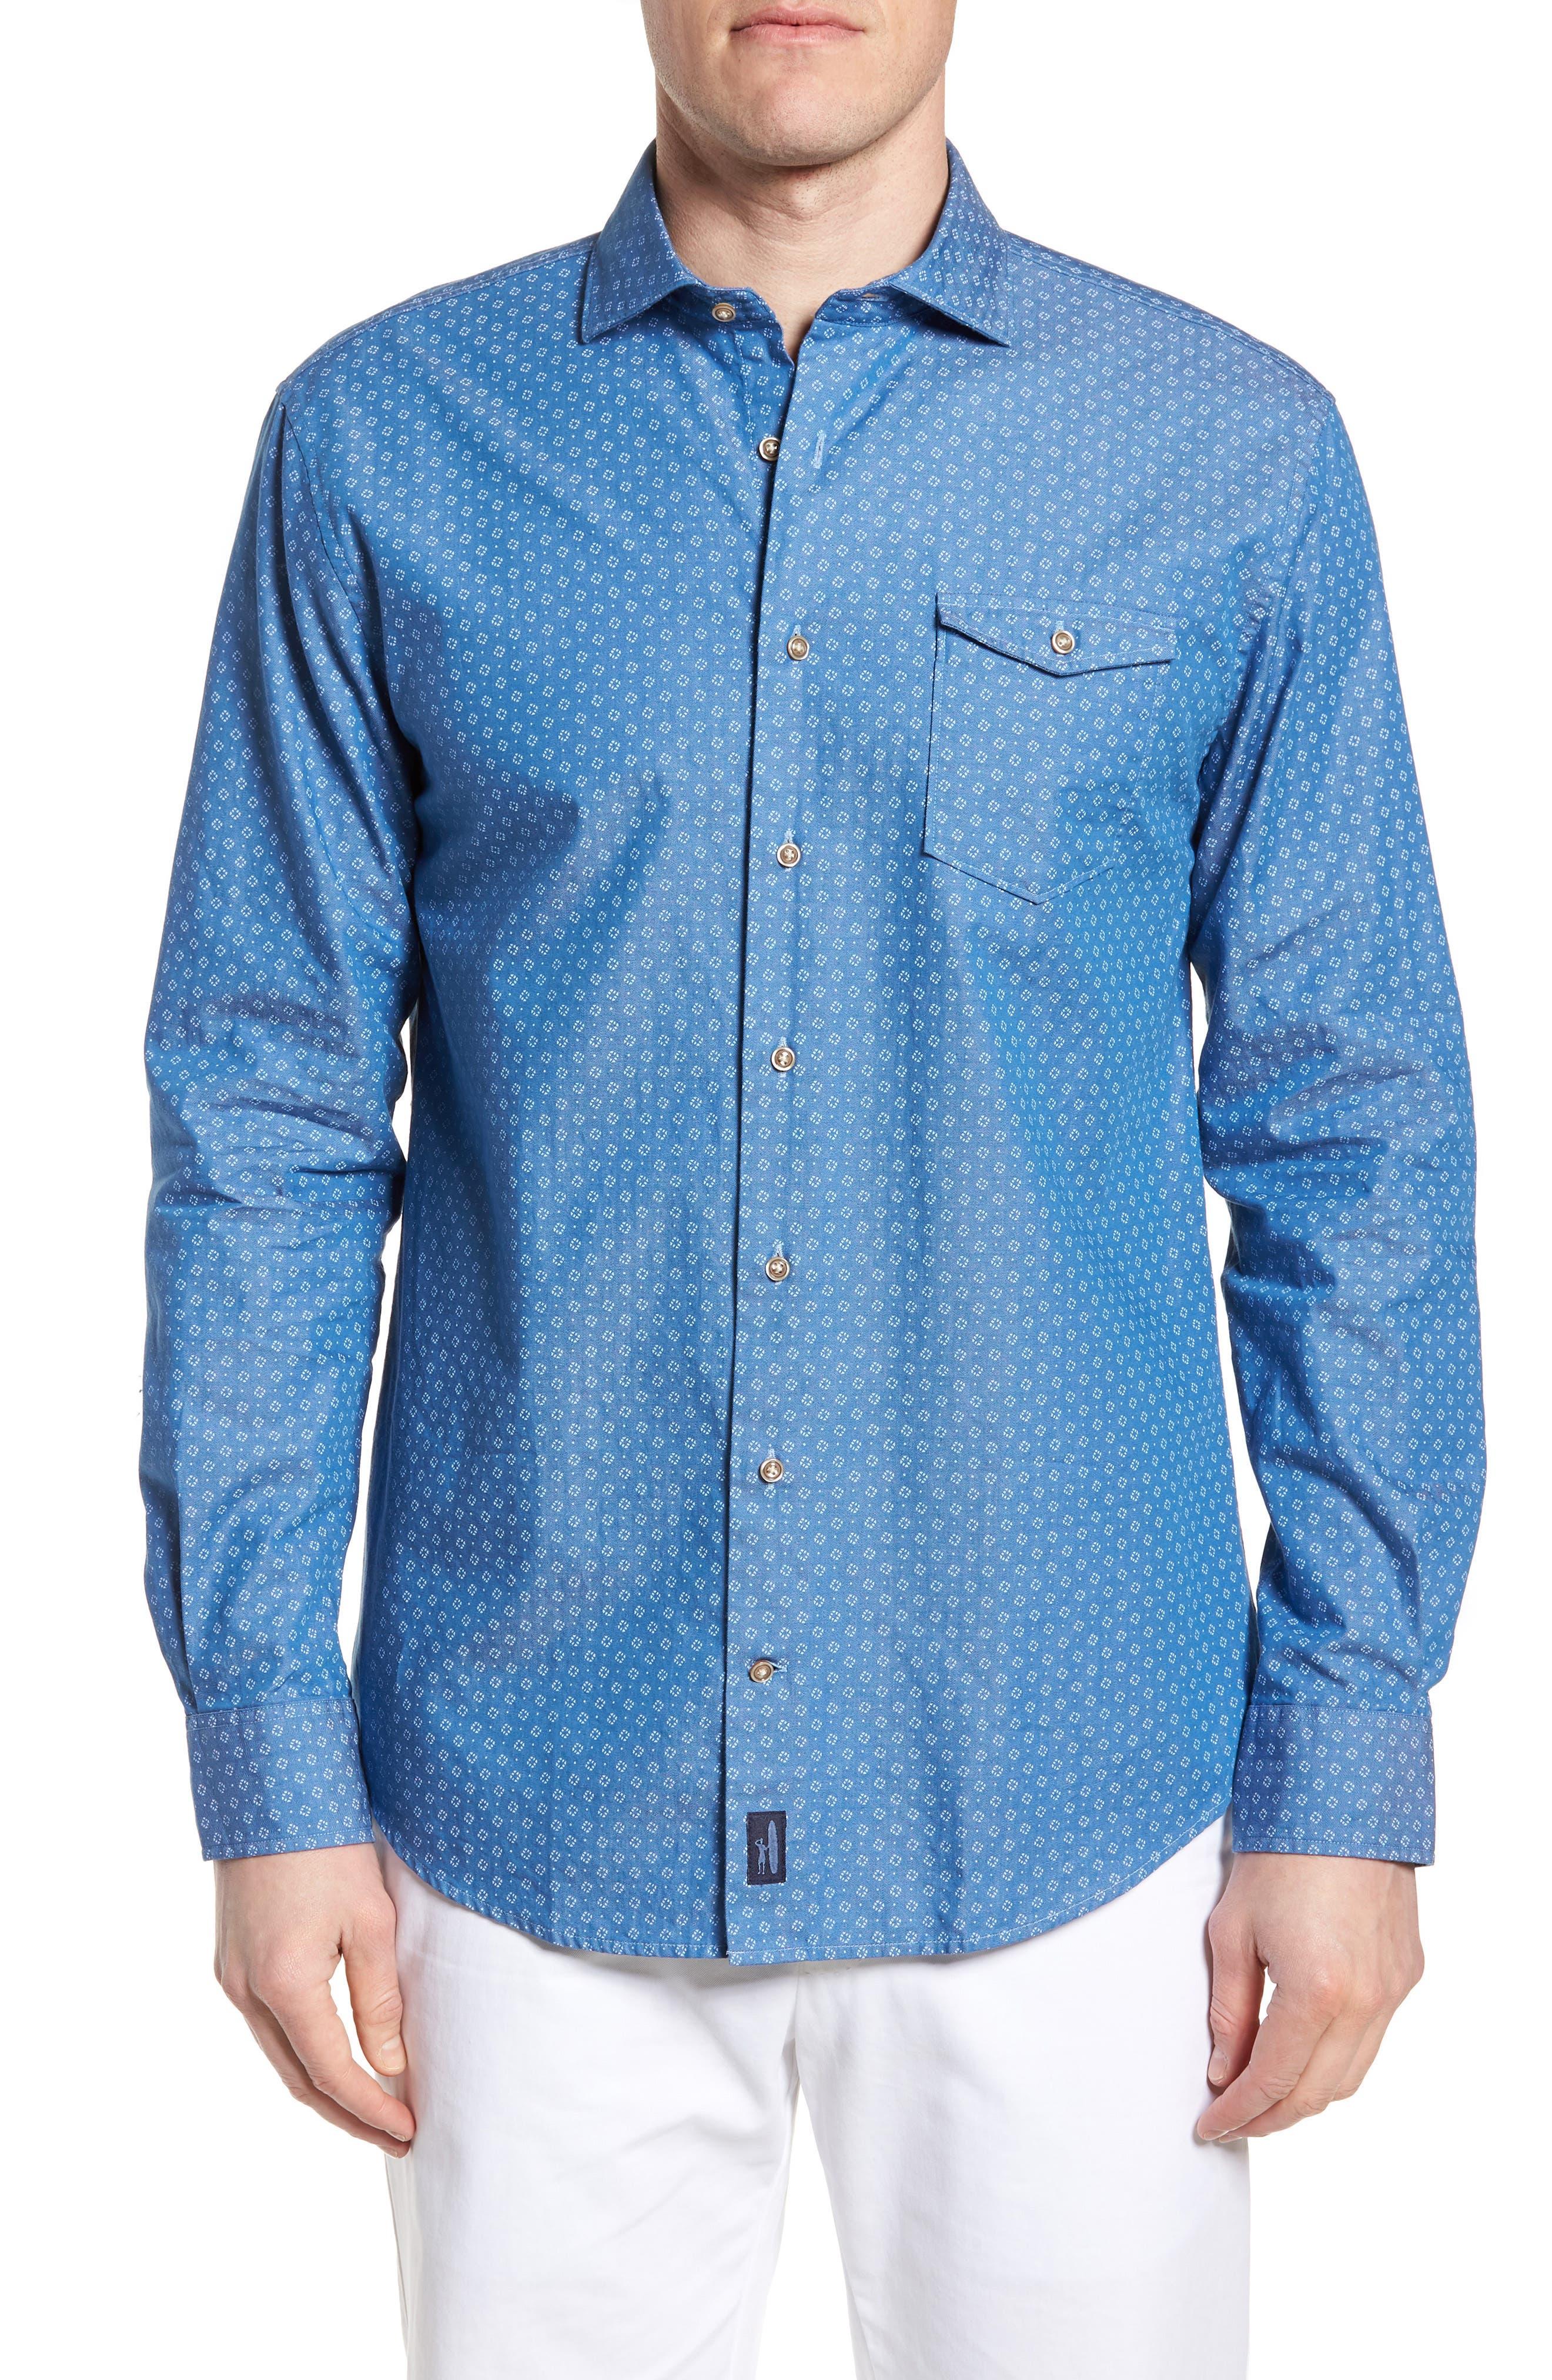 Barclay Regular Fit Sport Shirt,                         Main,                         color, 250